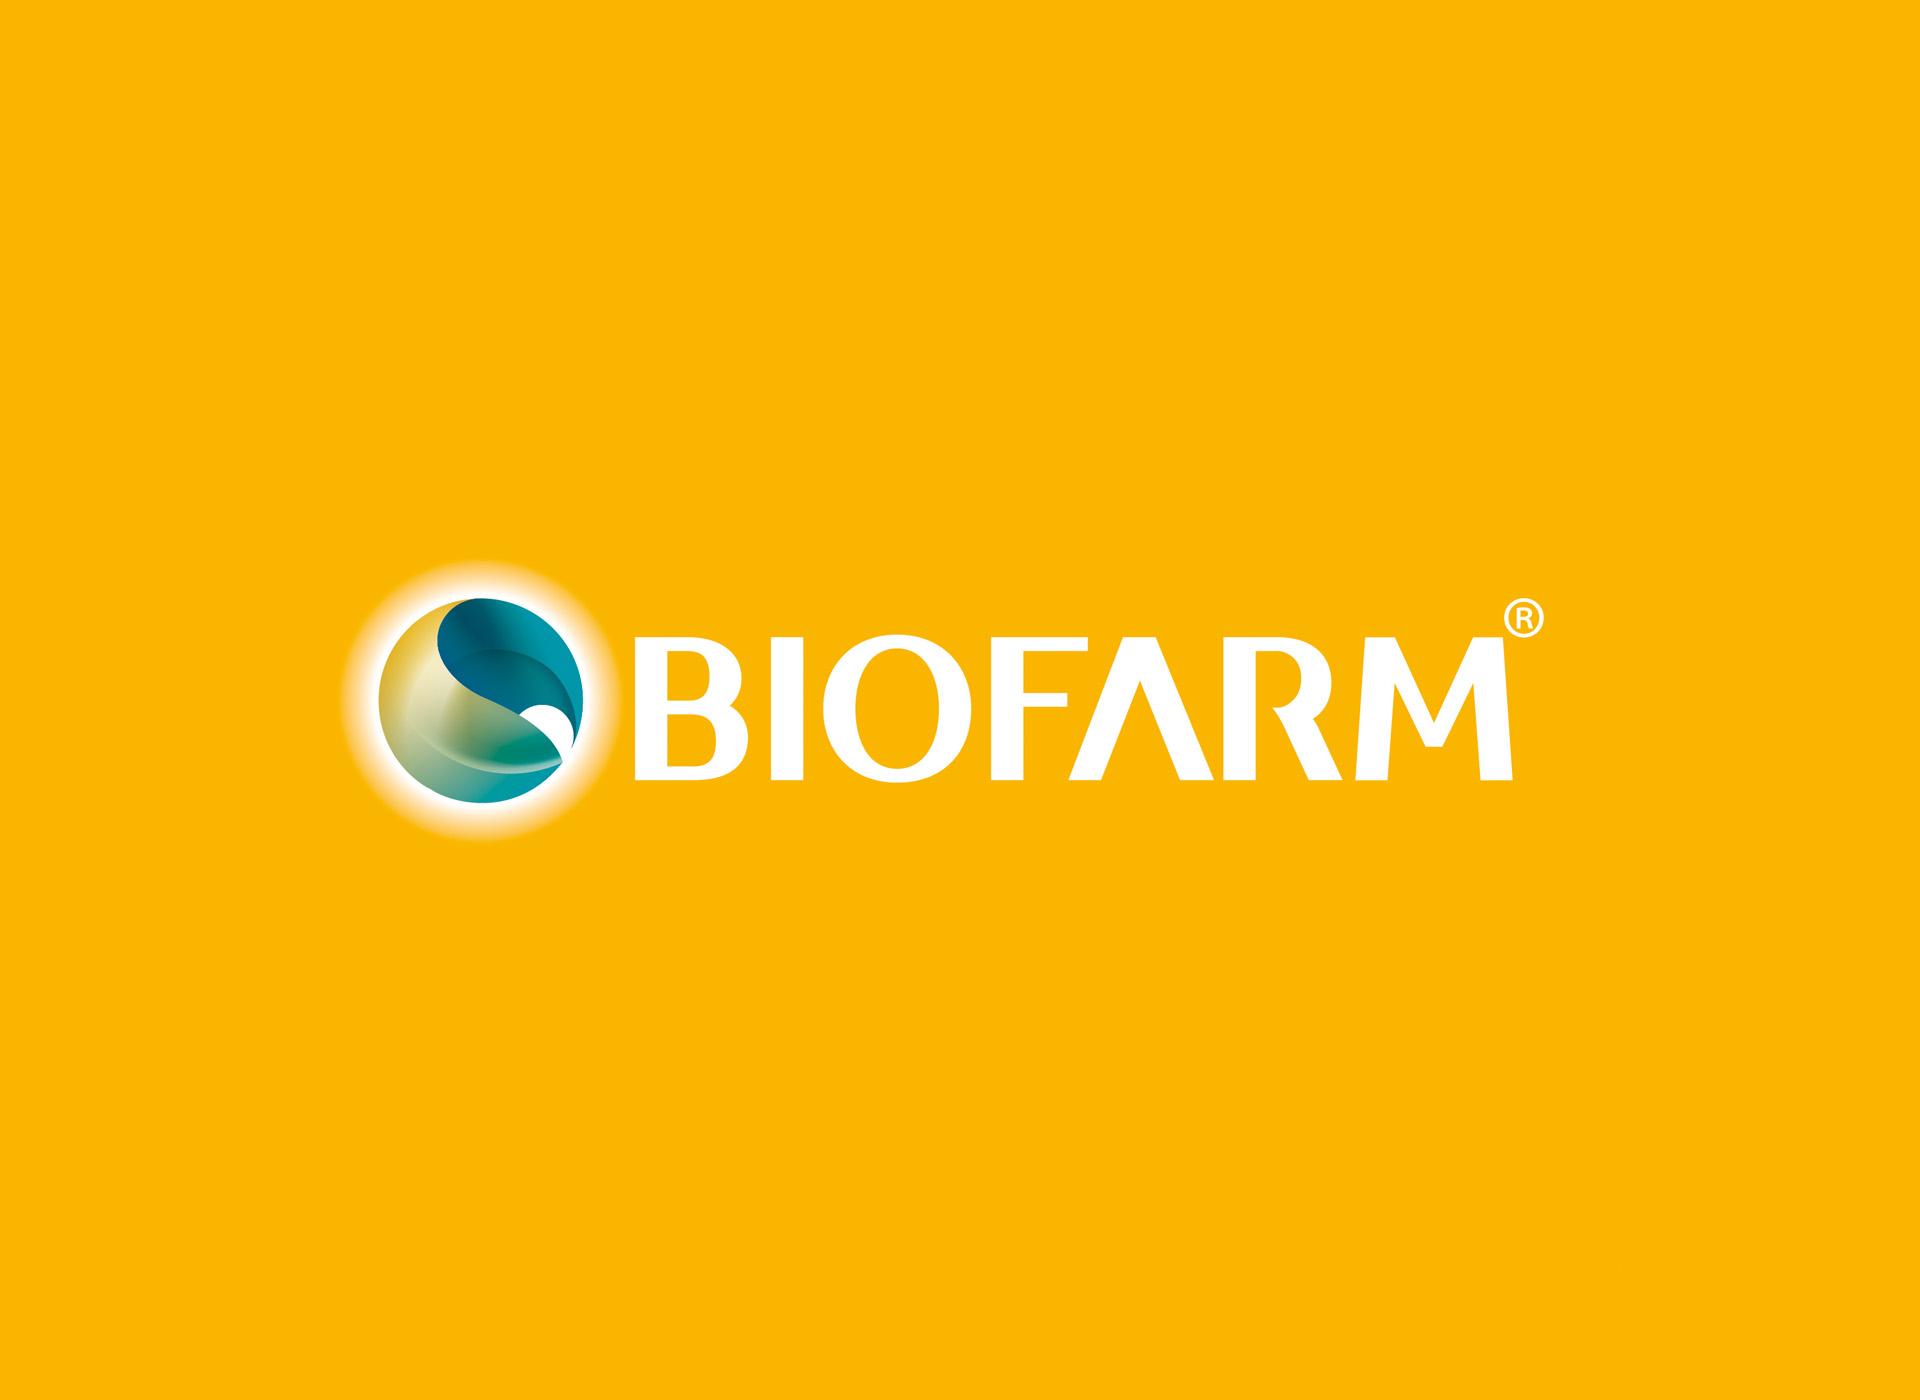 Biofarm portofoliu inoveo logo